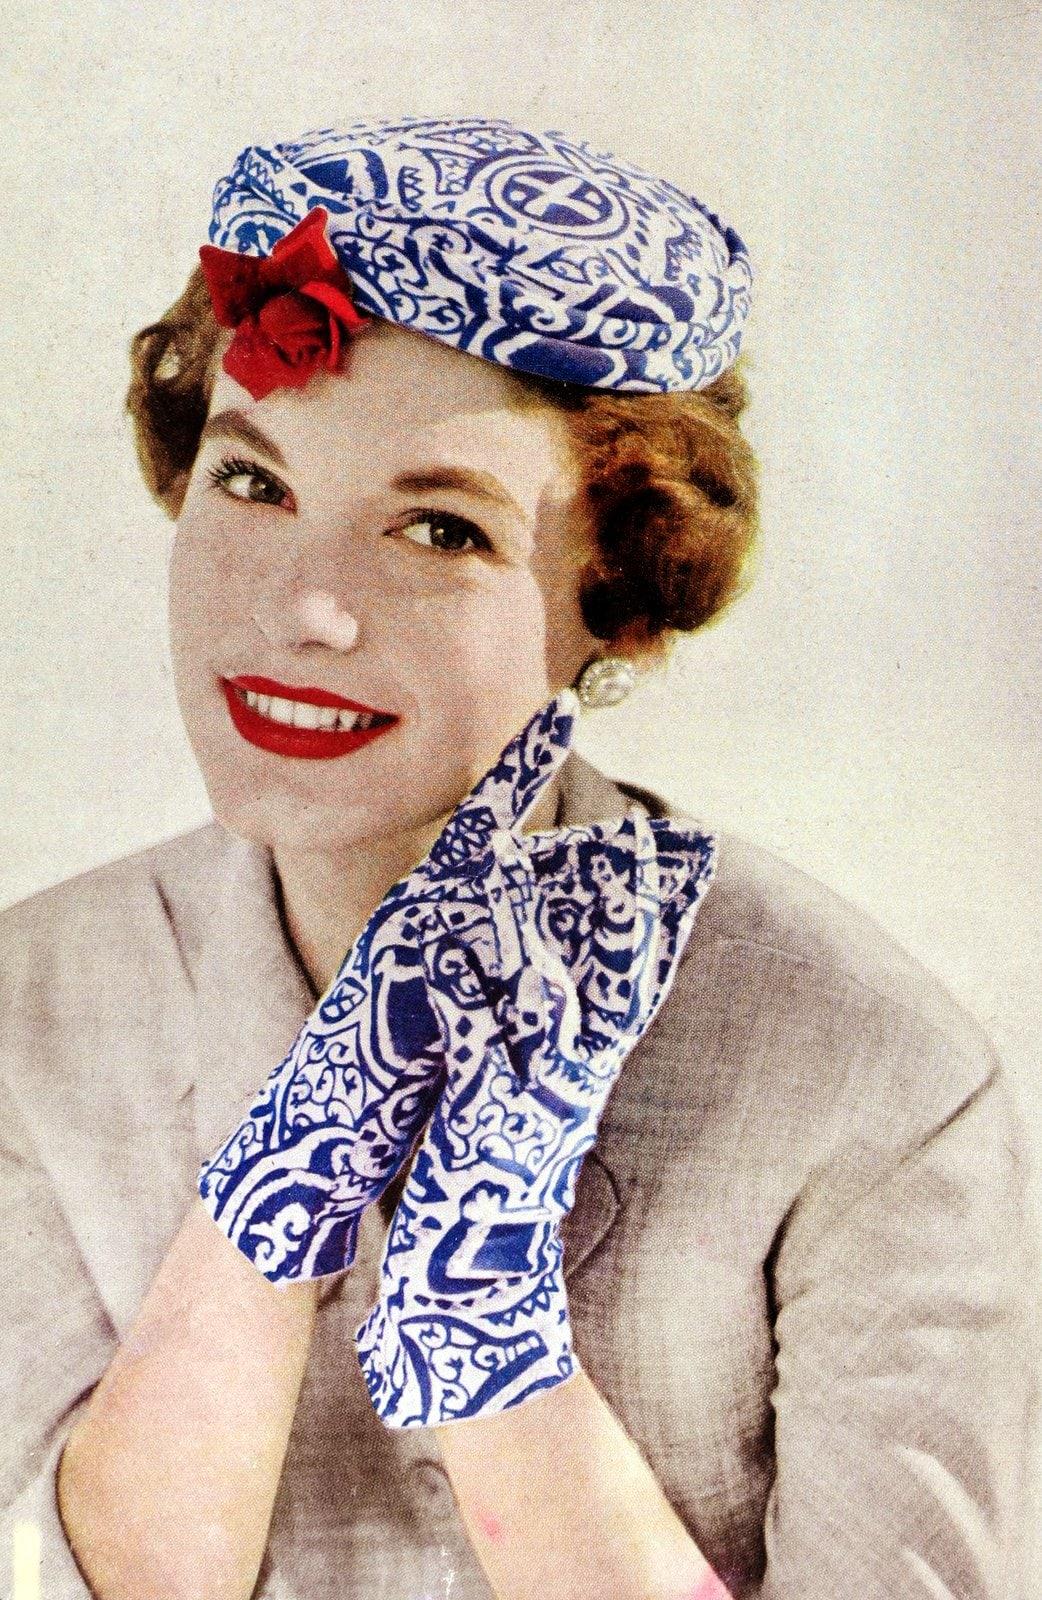 Vintage 50s women wearing gloves (11)